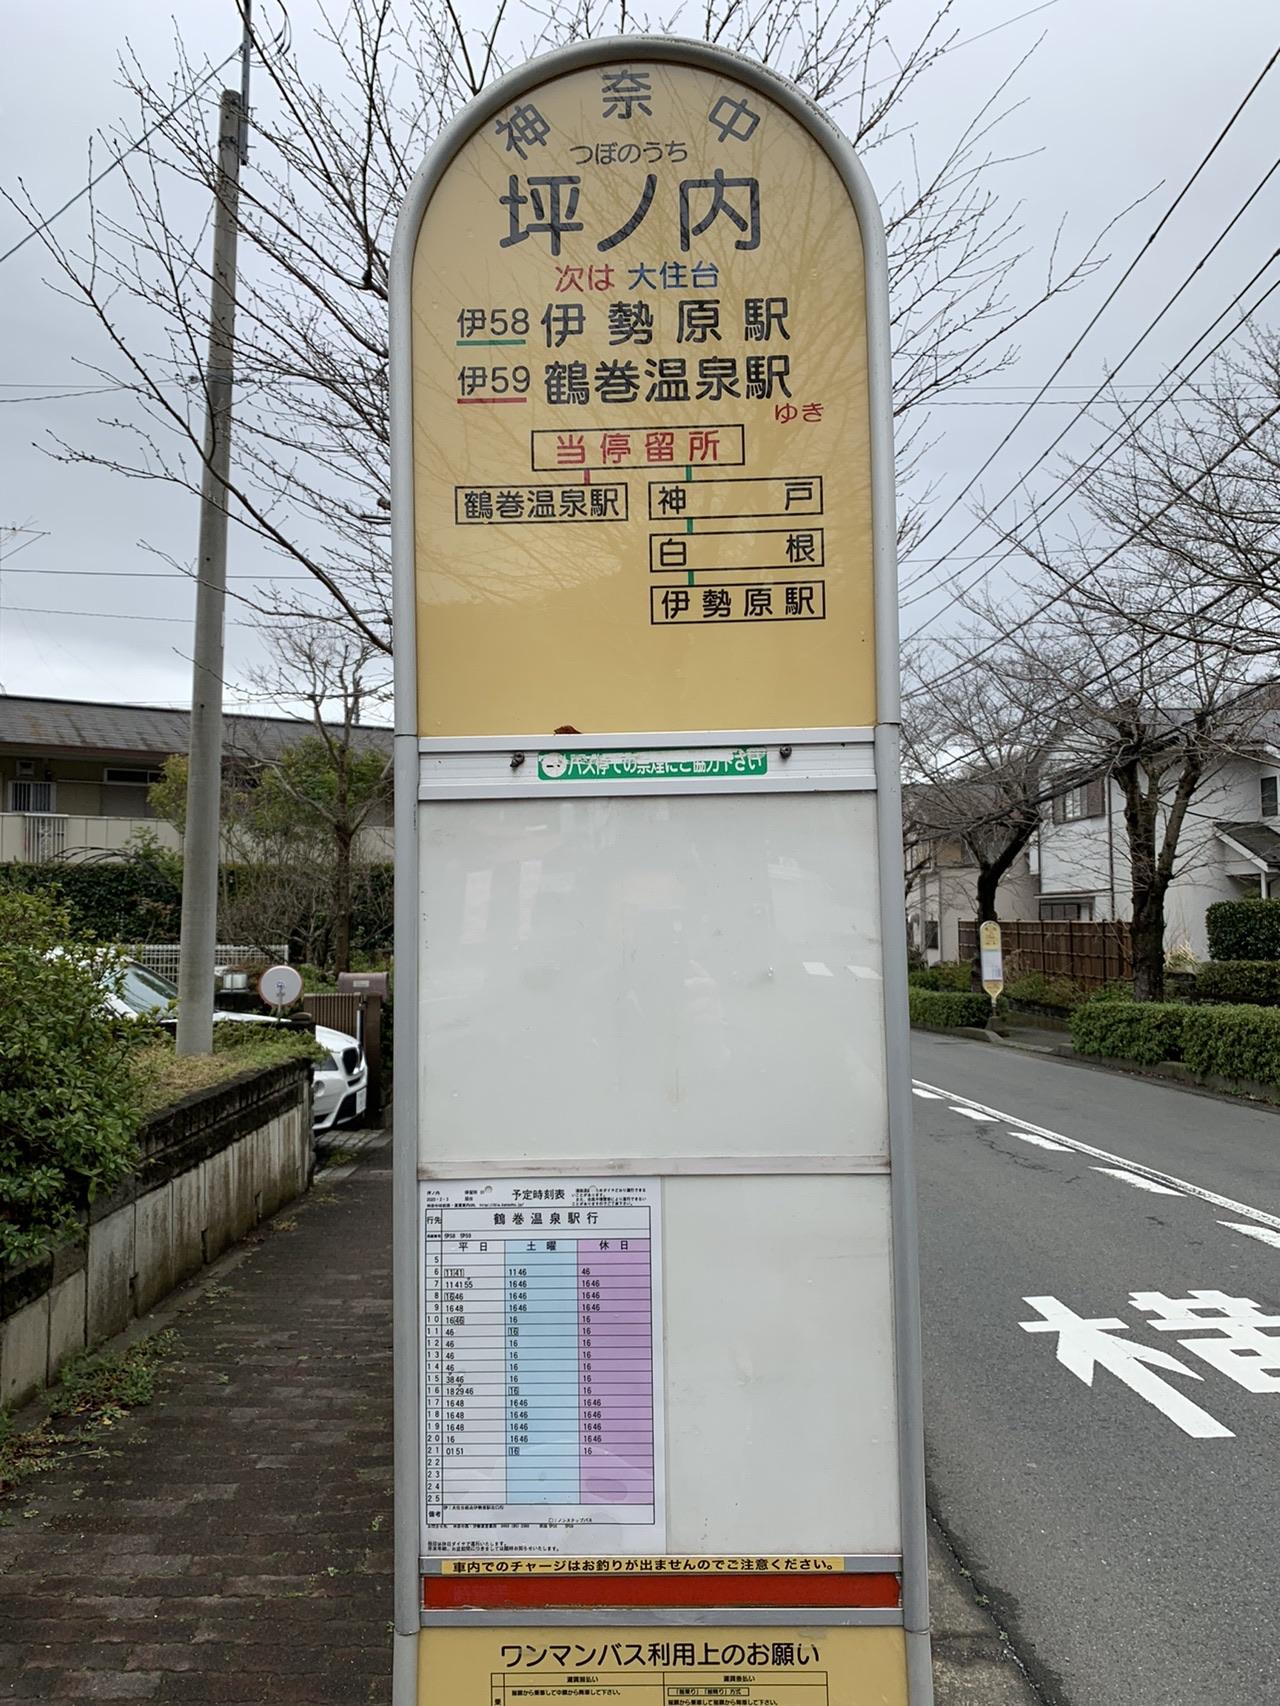 https://cdn.yamap.co.jp/public/image2.yamap.co.jp/production/213d42fbb907494faa3e485b136651dd